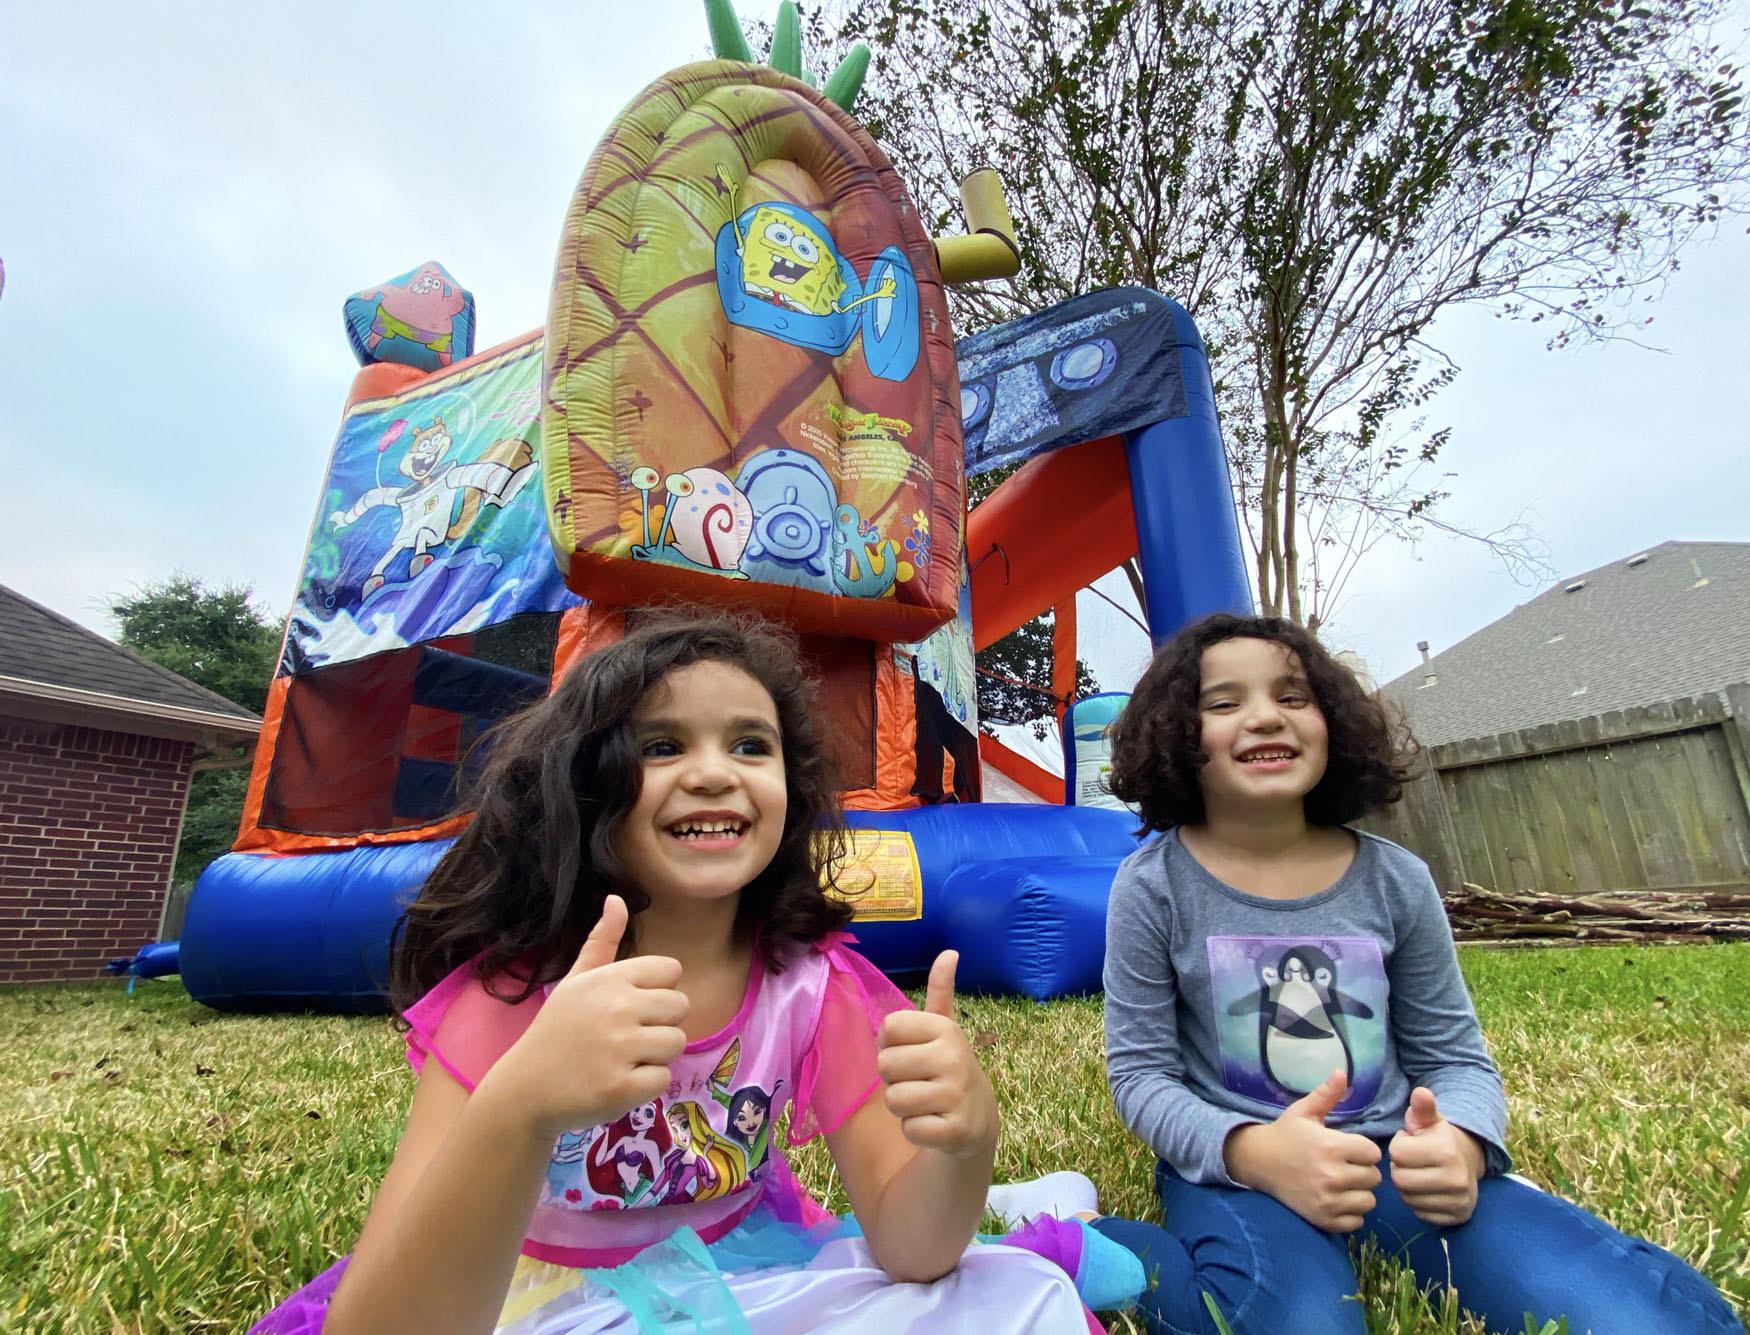 Spongebob Bounce House Childrens Party Rentals